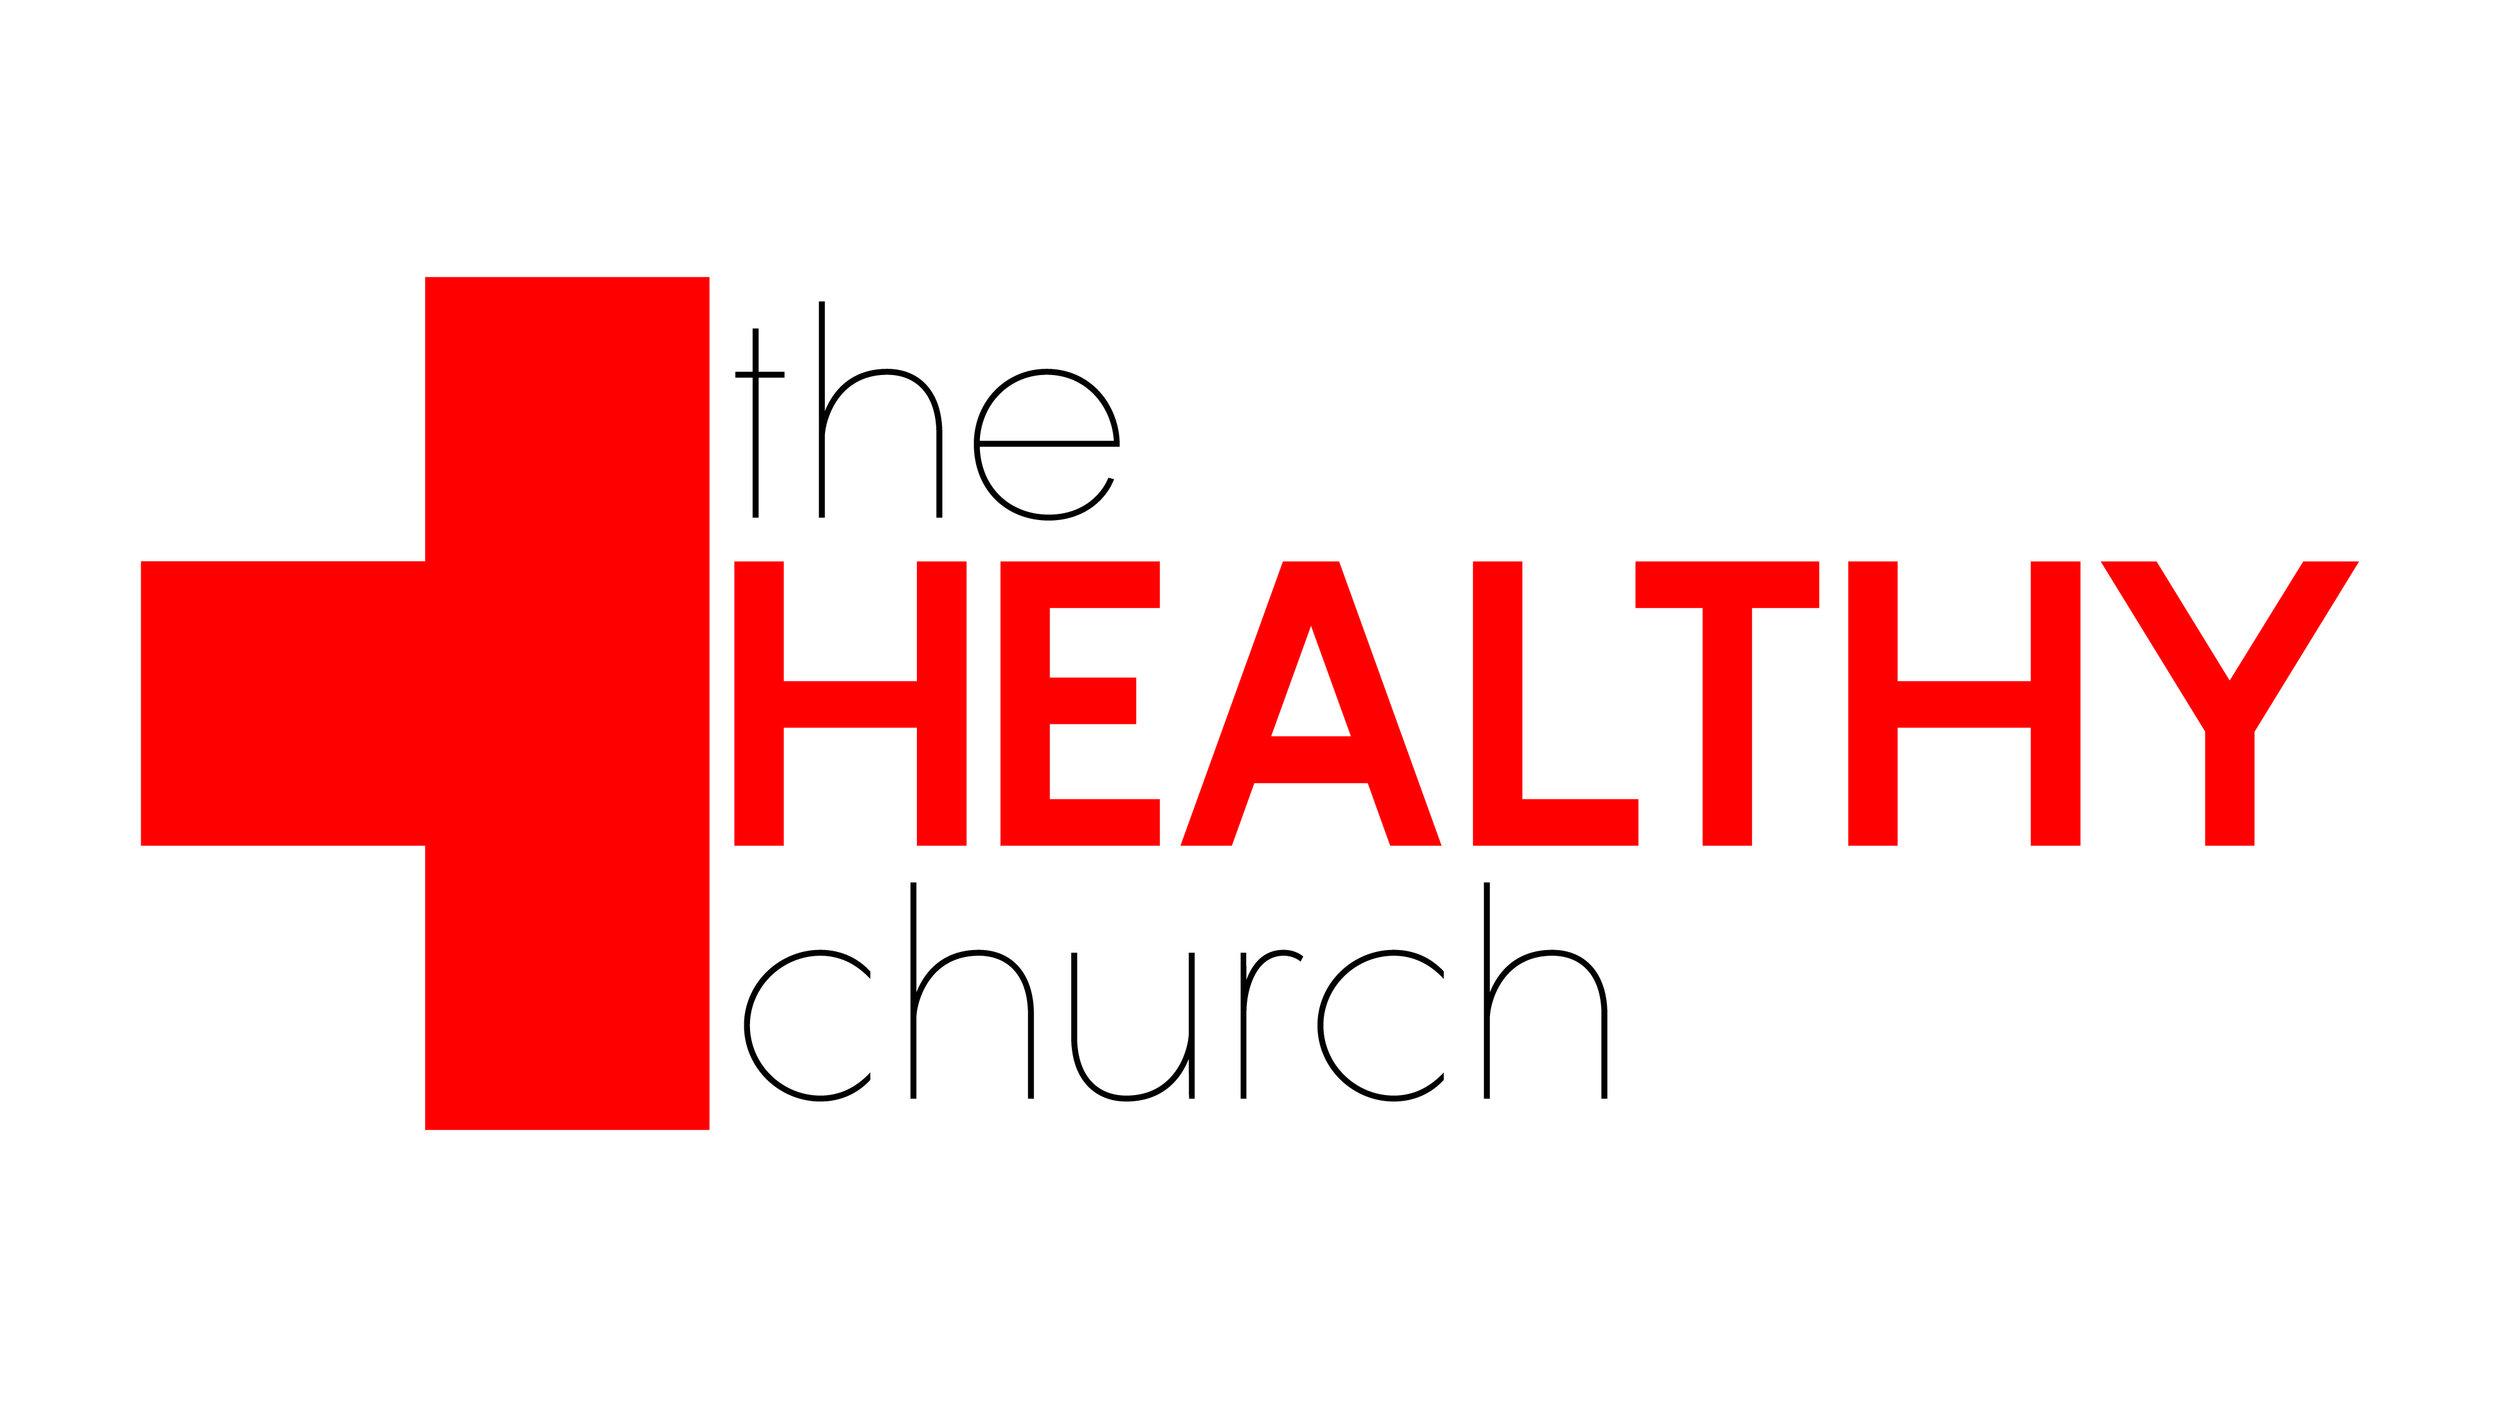 Healthy Church Logo-06.jpg